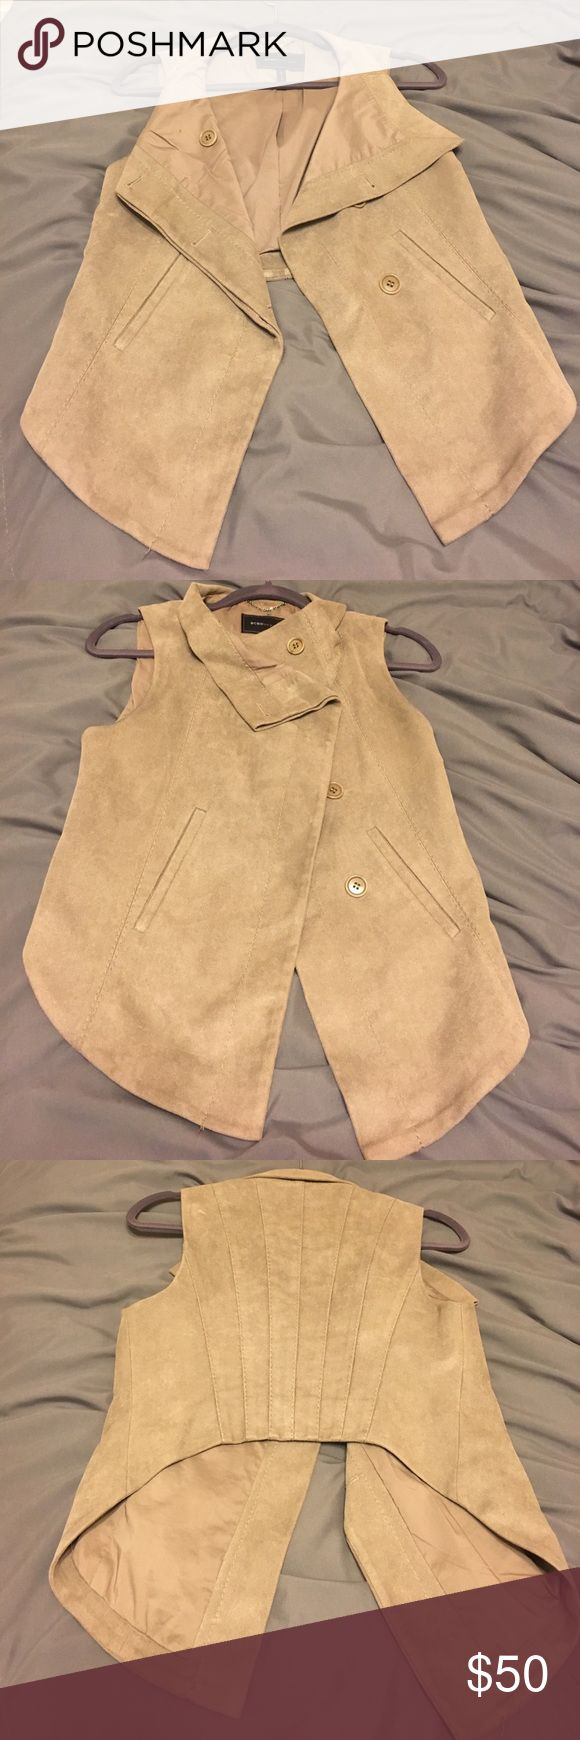 Bcbg MaxAzria vest Gently worn tan vest...92% polyester/8% spandex...faux suede BCBGMaxAzria Jackets & Coats Vests